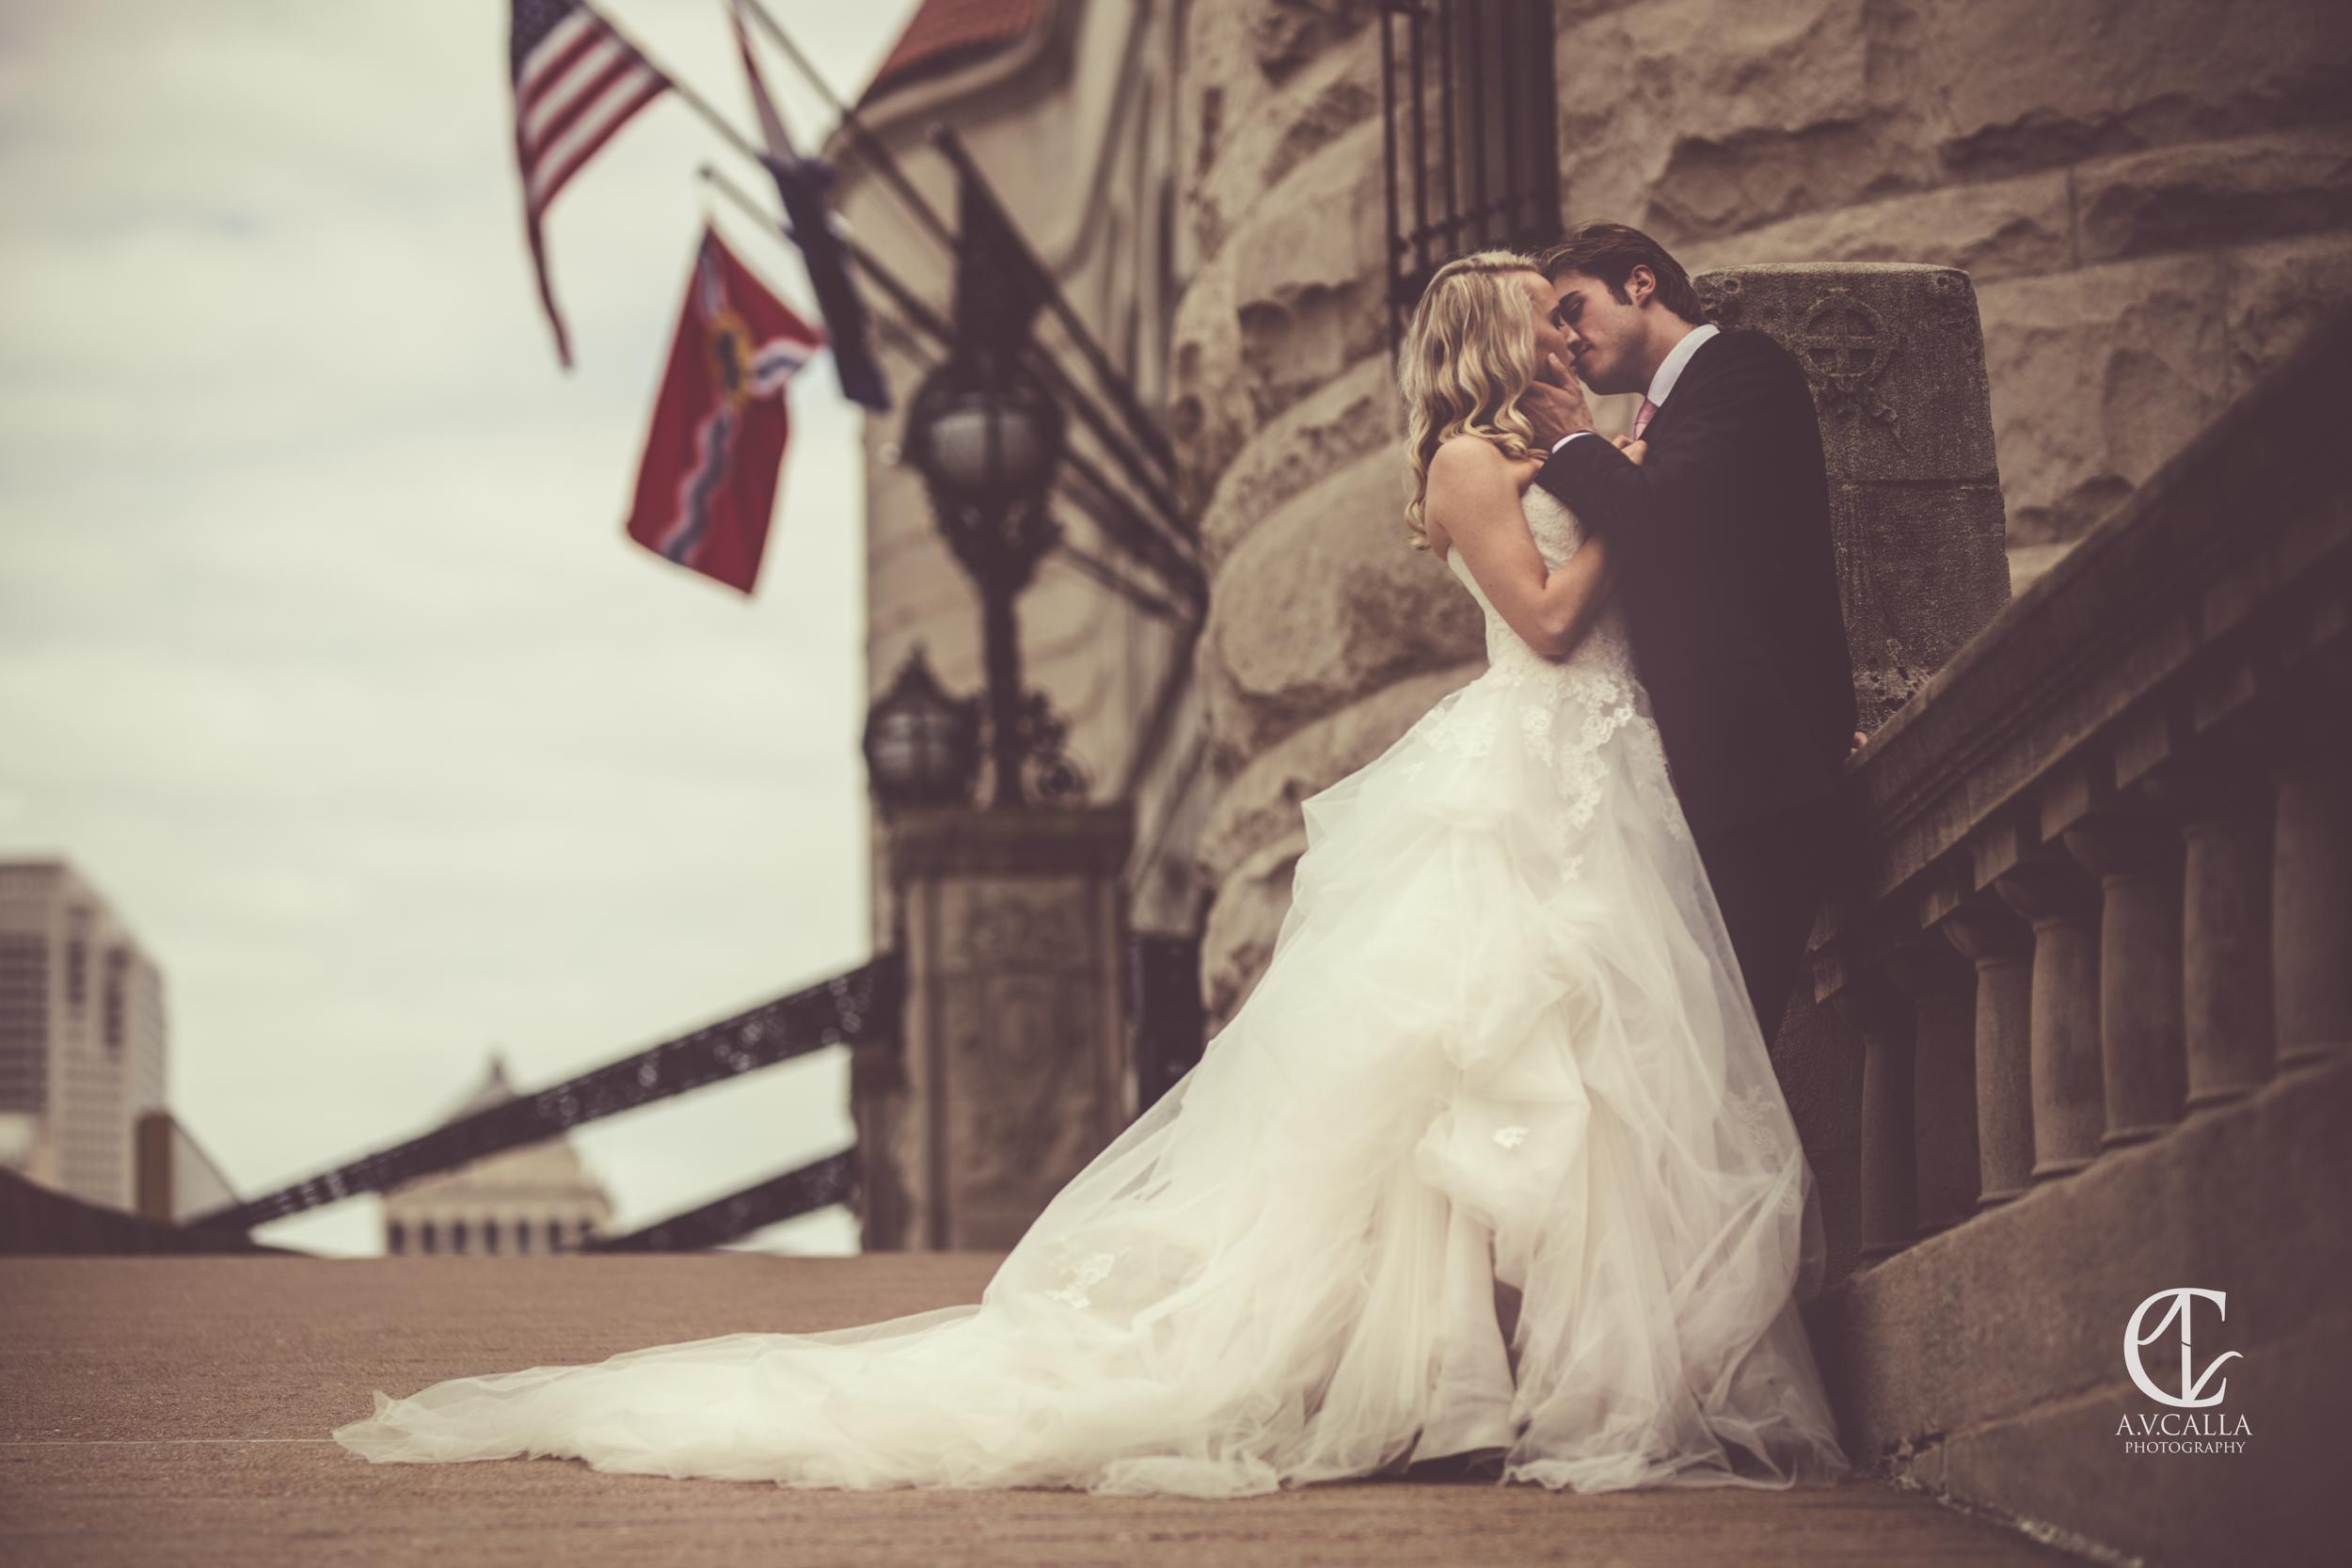 AVCalla-Wedding-Arch-St.Louis-2.jpg